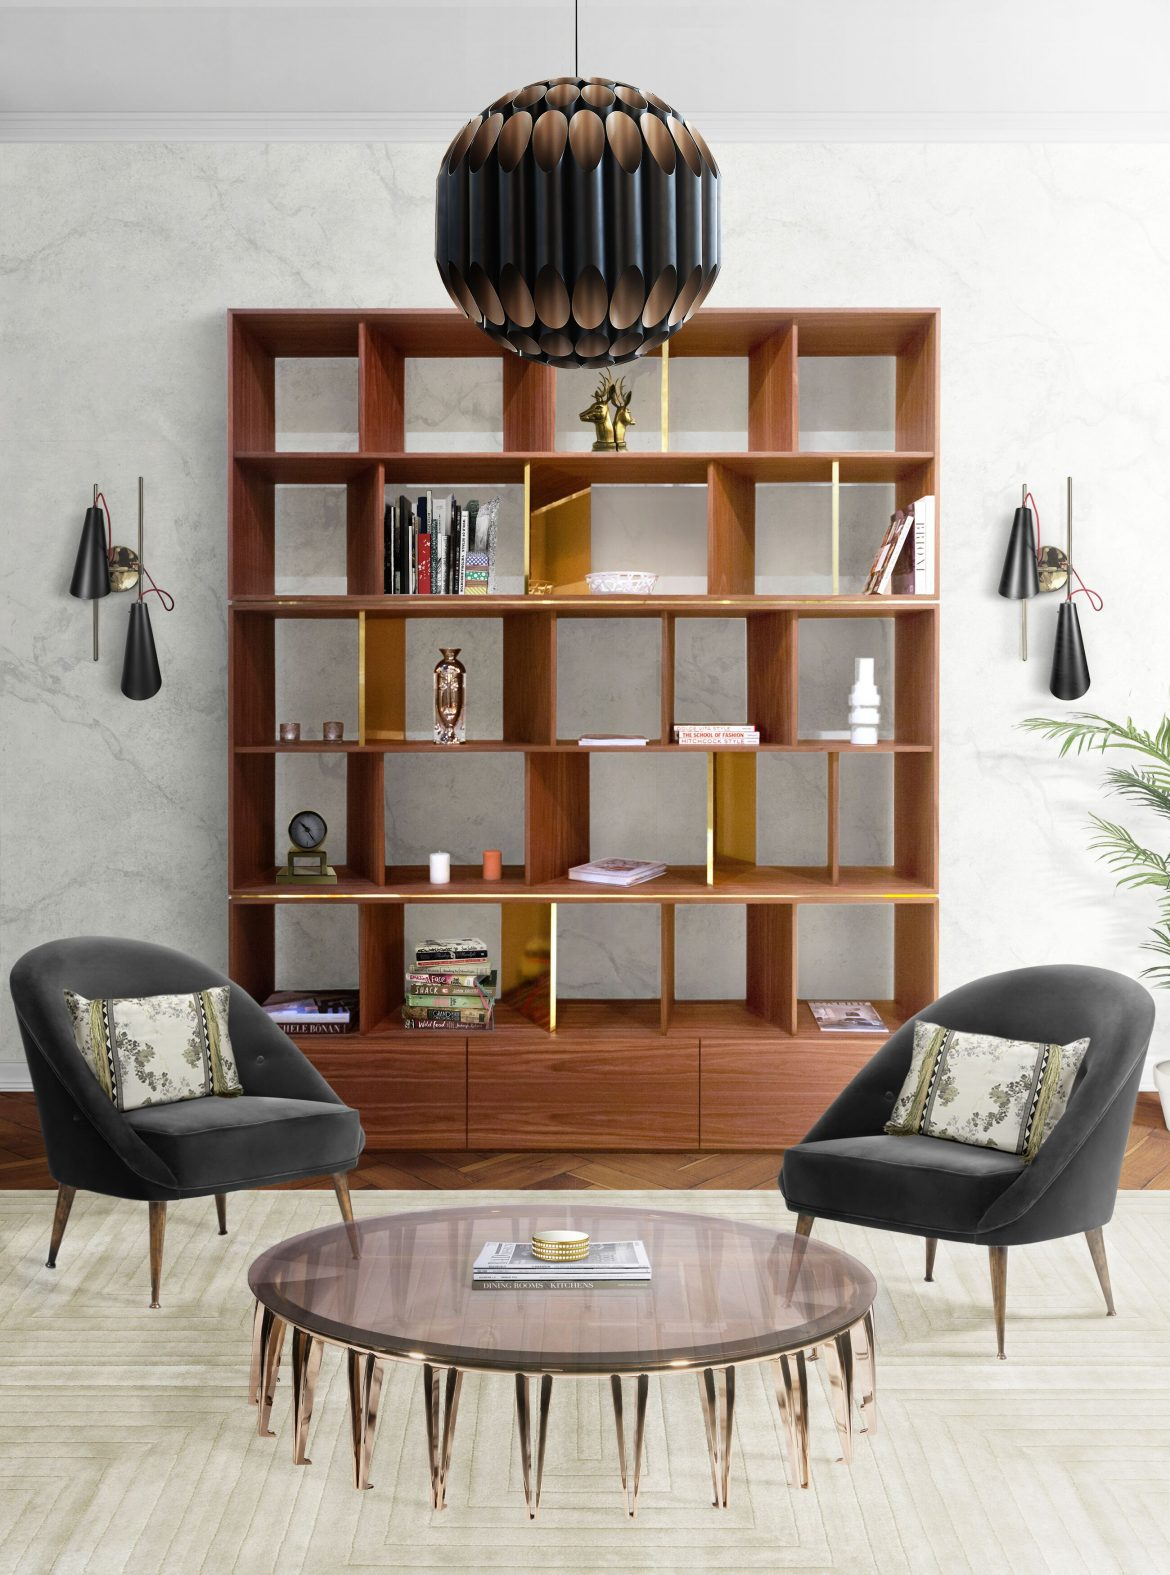 Living Room Ideas: TOP 5 Coffee Table living room ideas Living Room Ideas: TOP 5 Coffee Tables Living Room Ideas TOP 5 Coffee Table 4